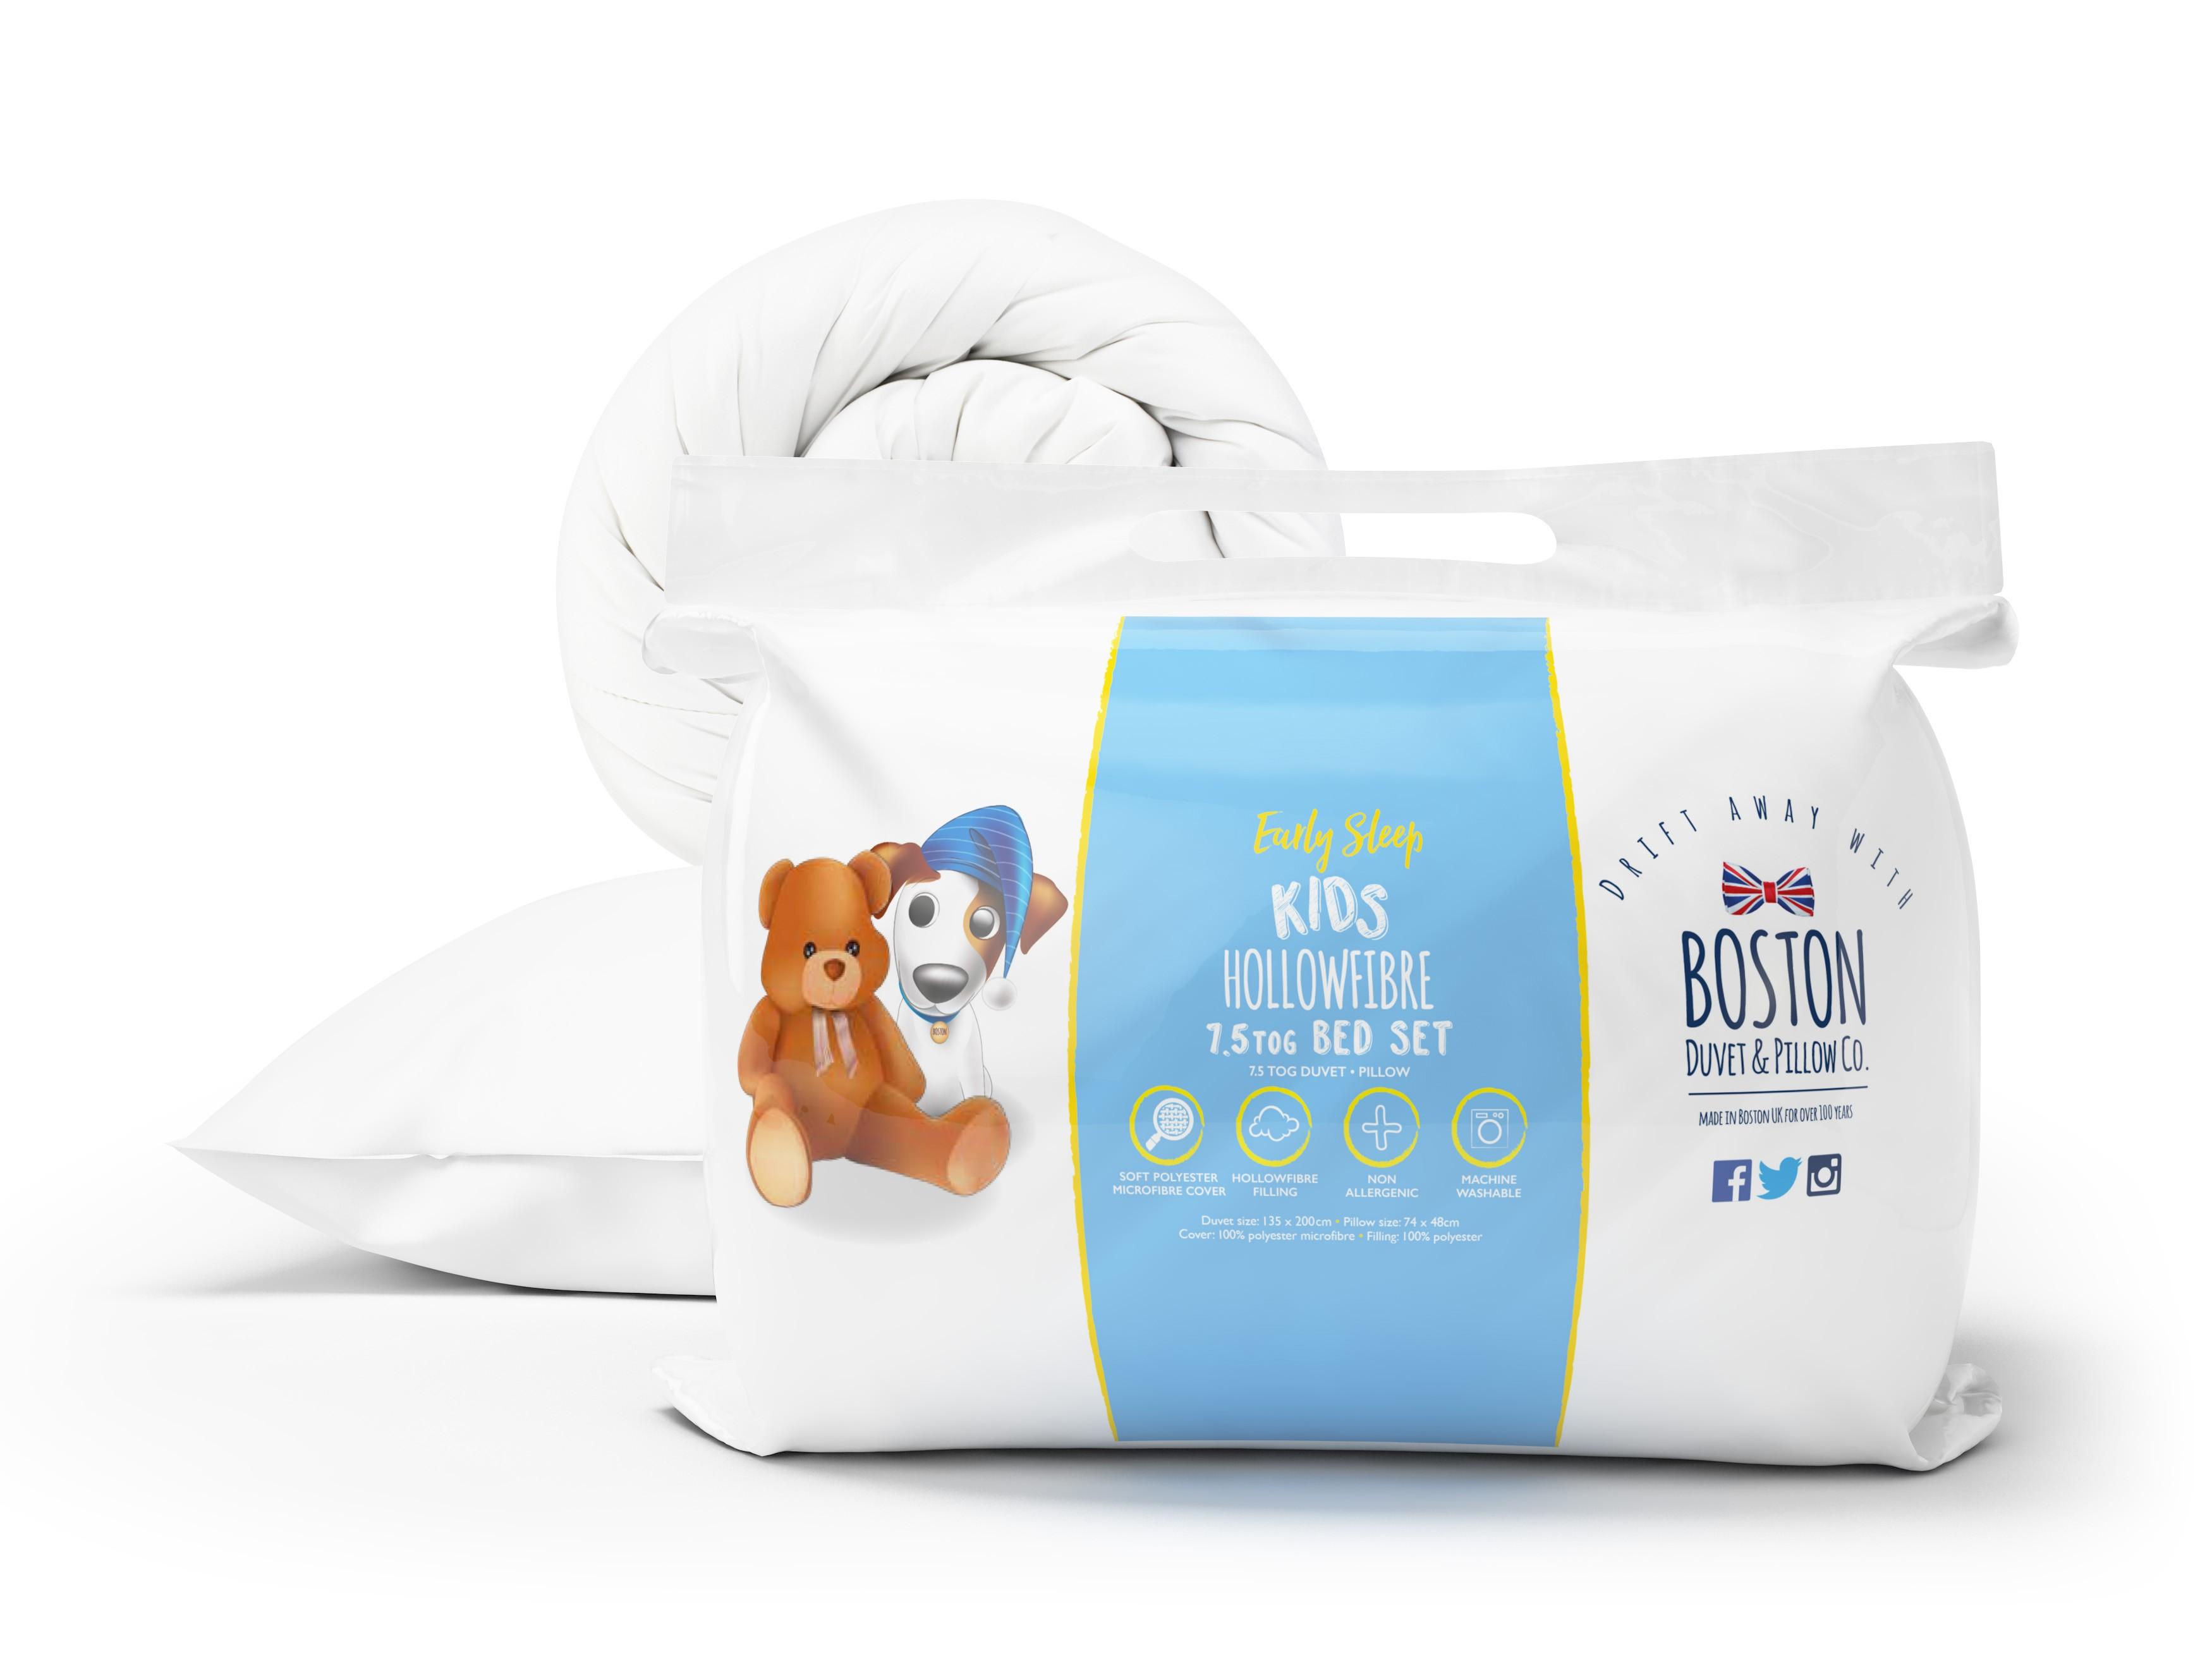 Boston Kids Duvet and Pillow Set 7.5 tog